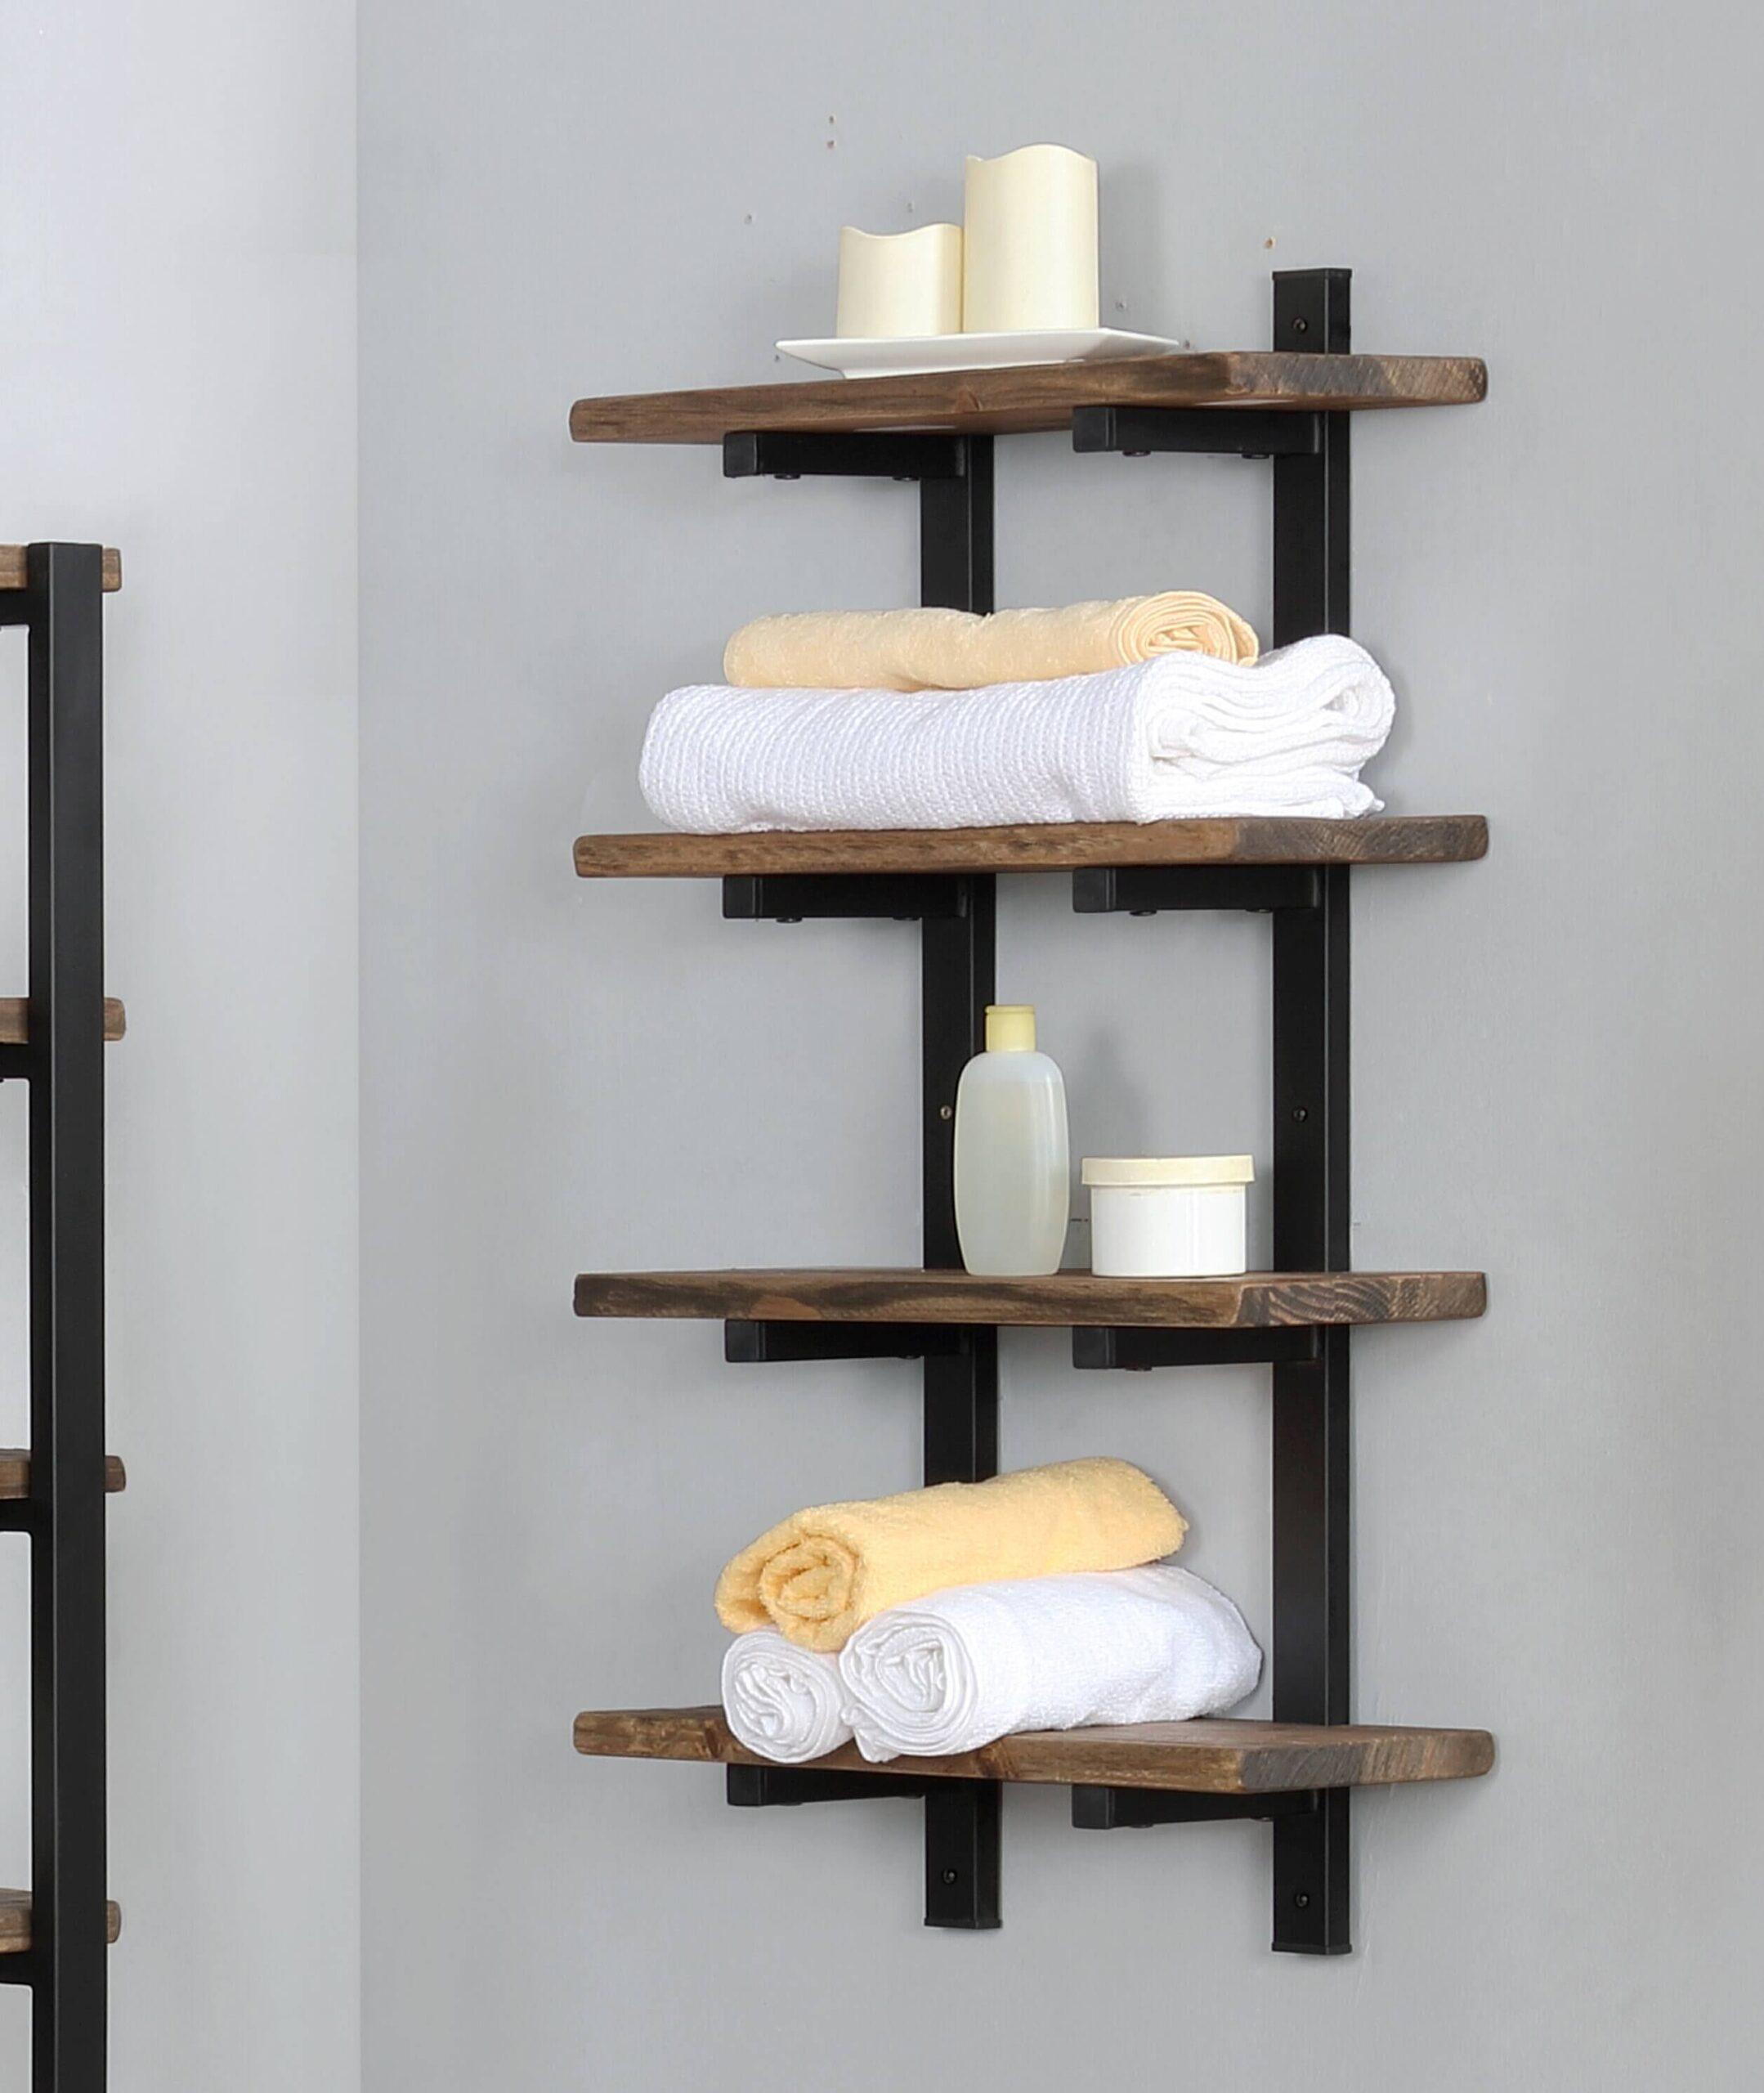 Install unusual shelves